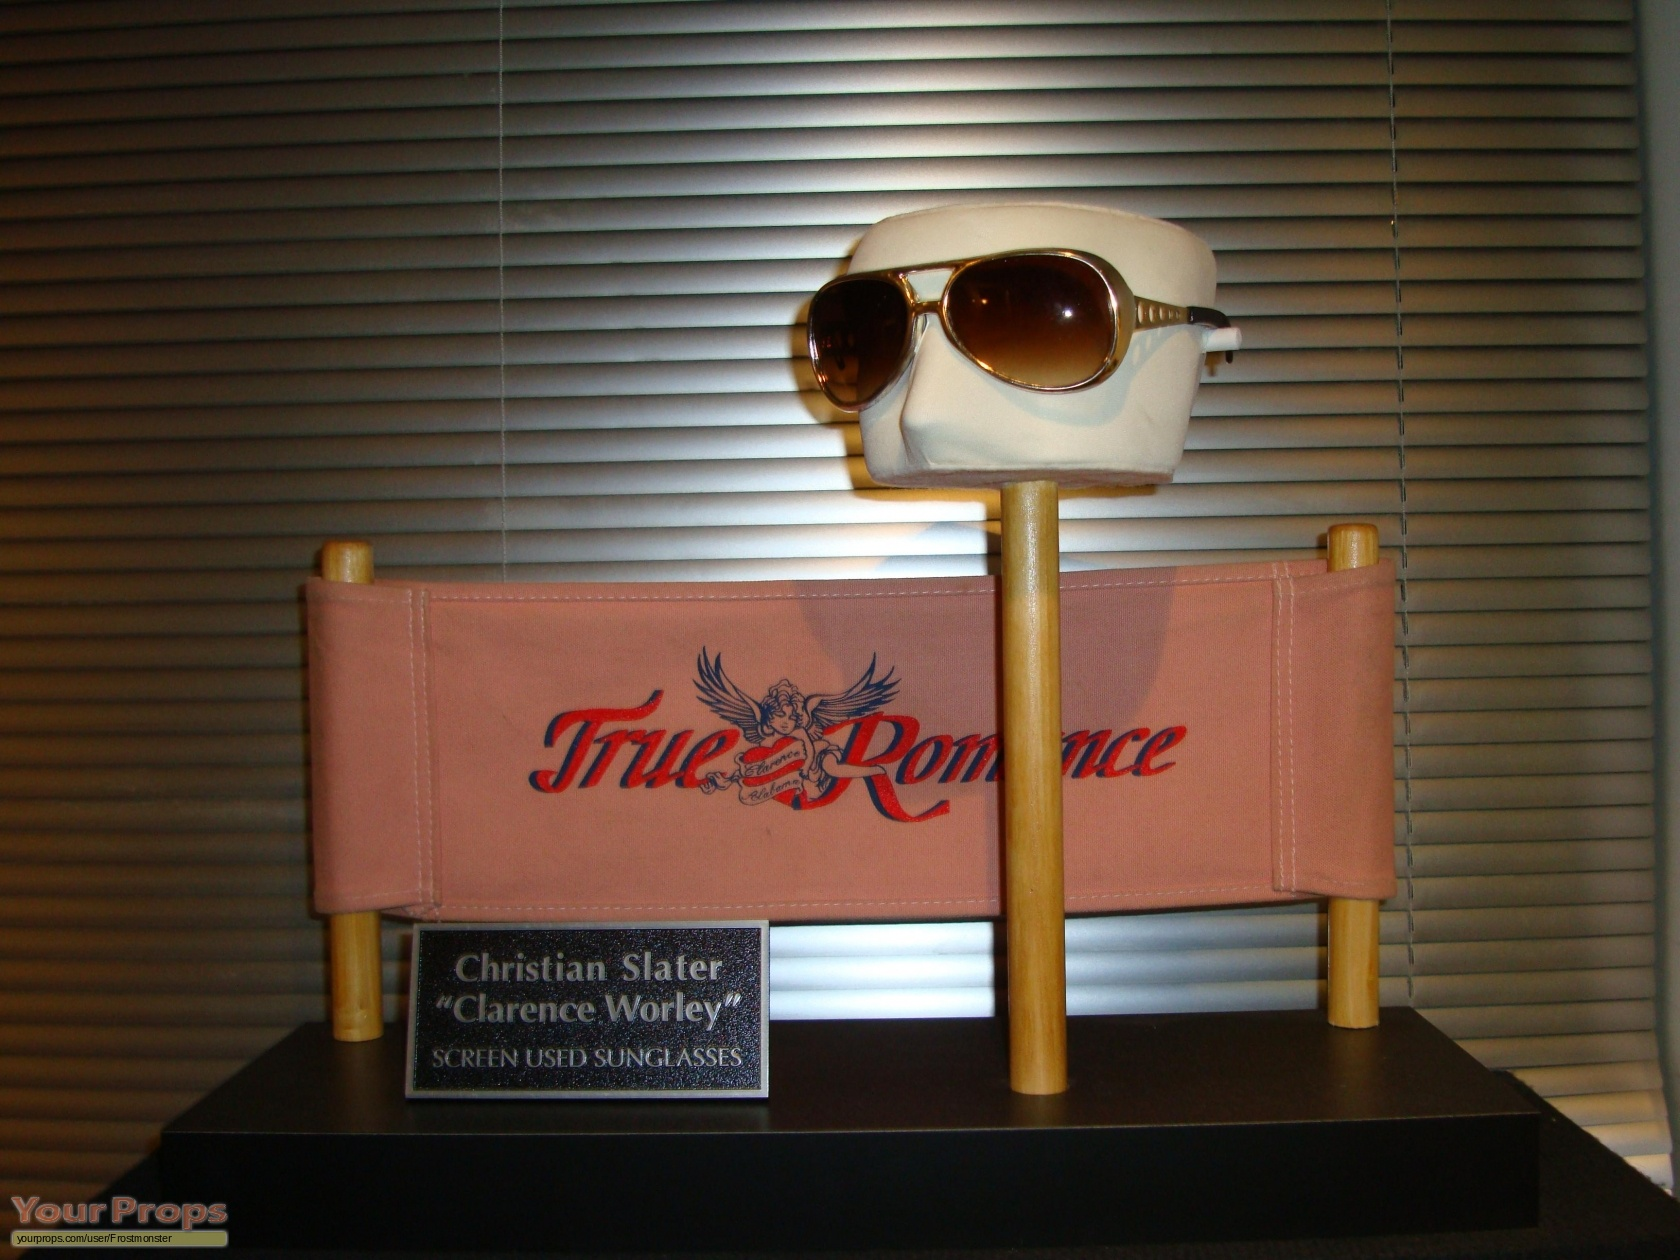 c479bb5c5111 True romance clarence worley hero sunglasses original movie prop jpg  1680x1260 Sun glasses true romance